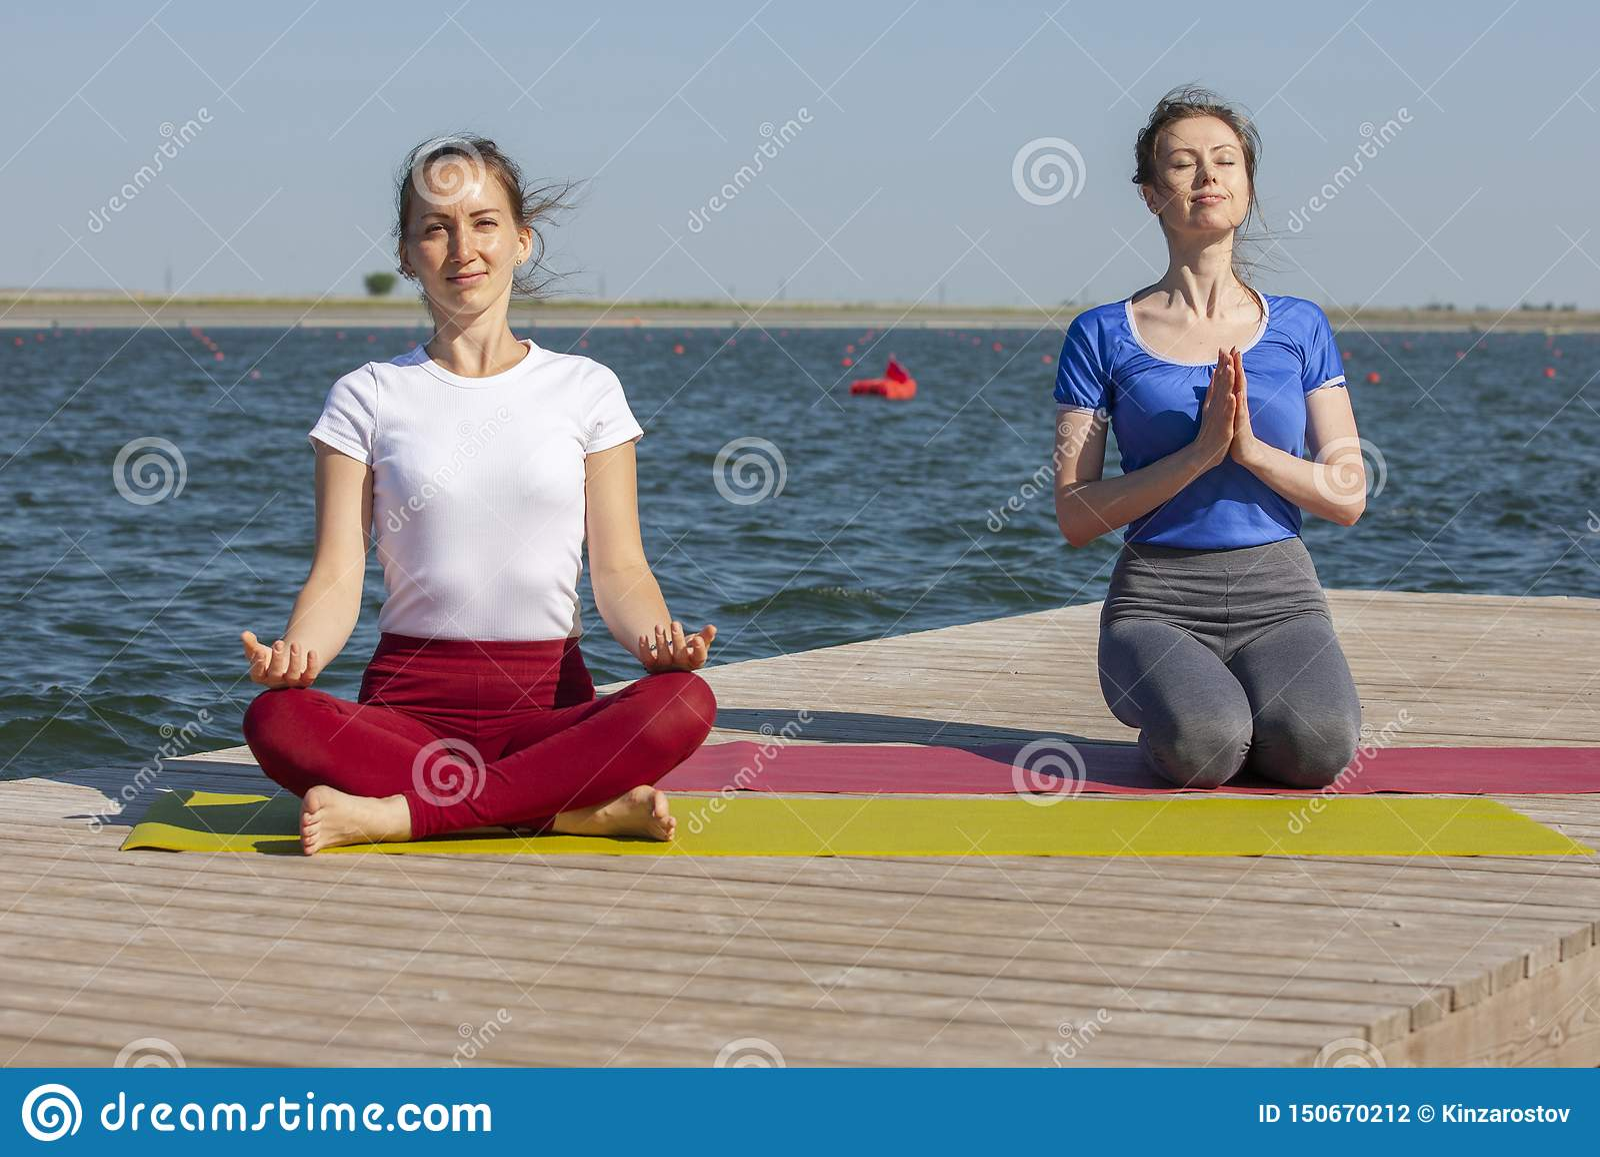 Sport, Fitness, Mensen En Levensstijlconcept - Sluit